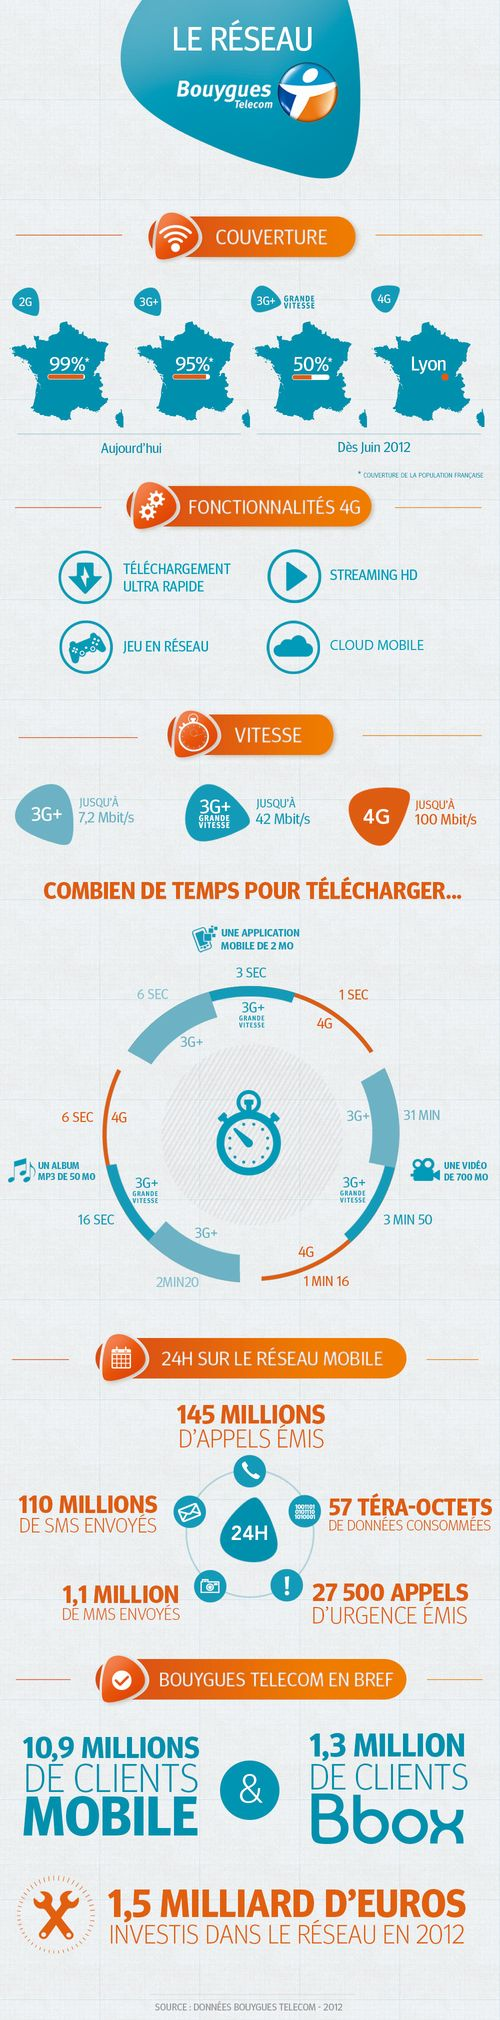 Infographie_Reseau_Bouygues_Telecom